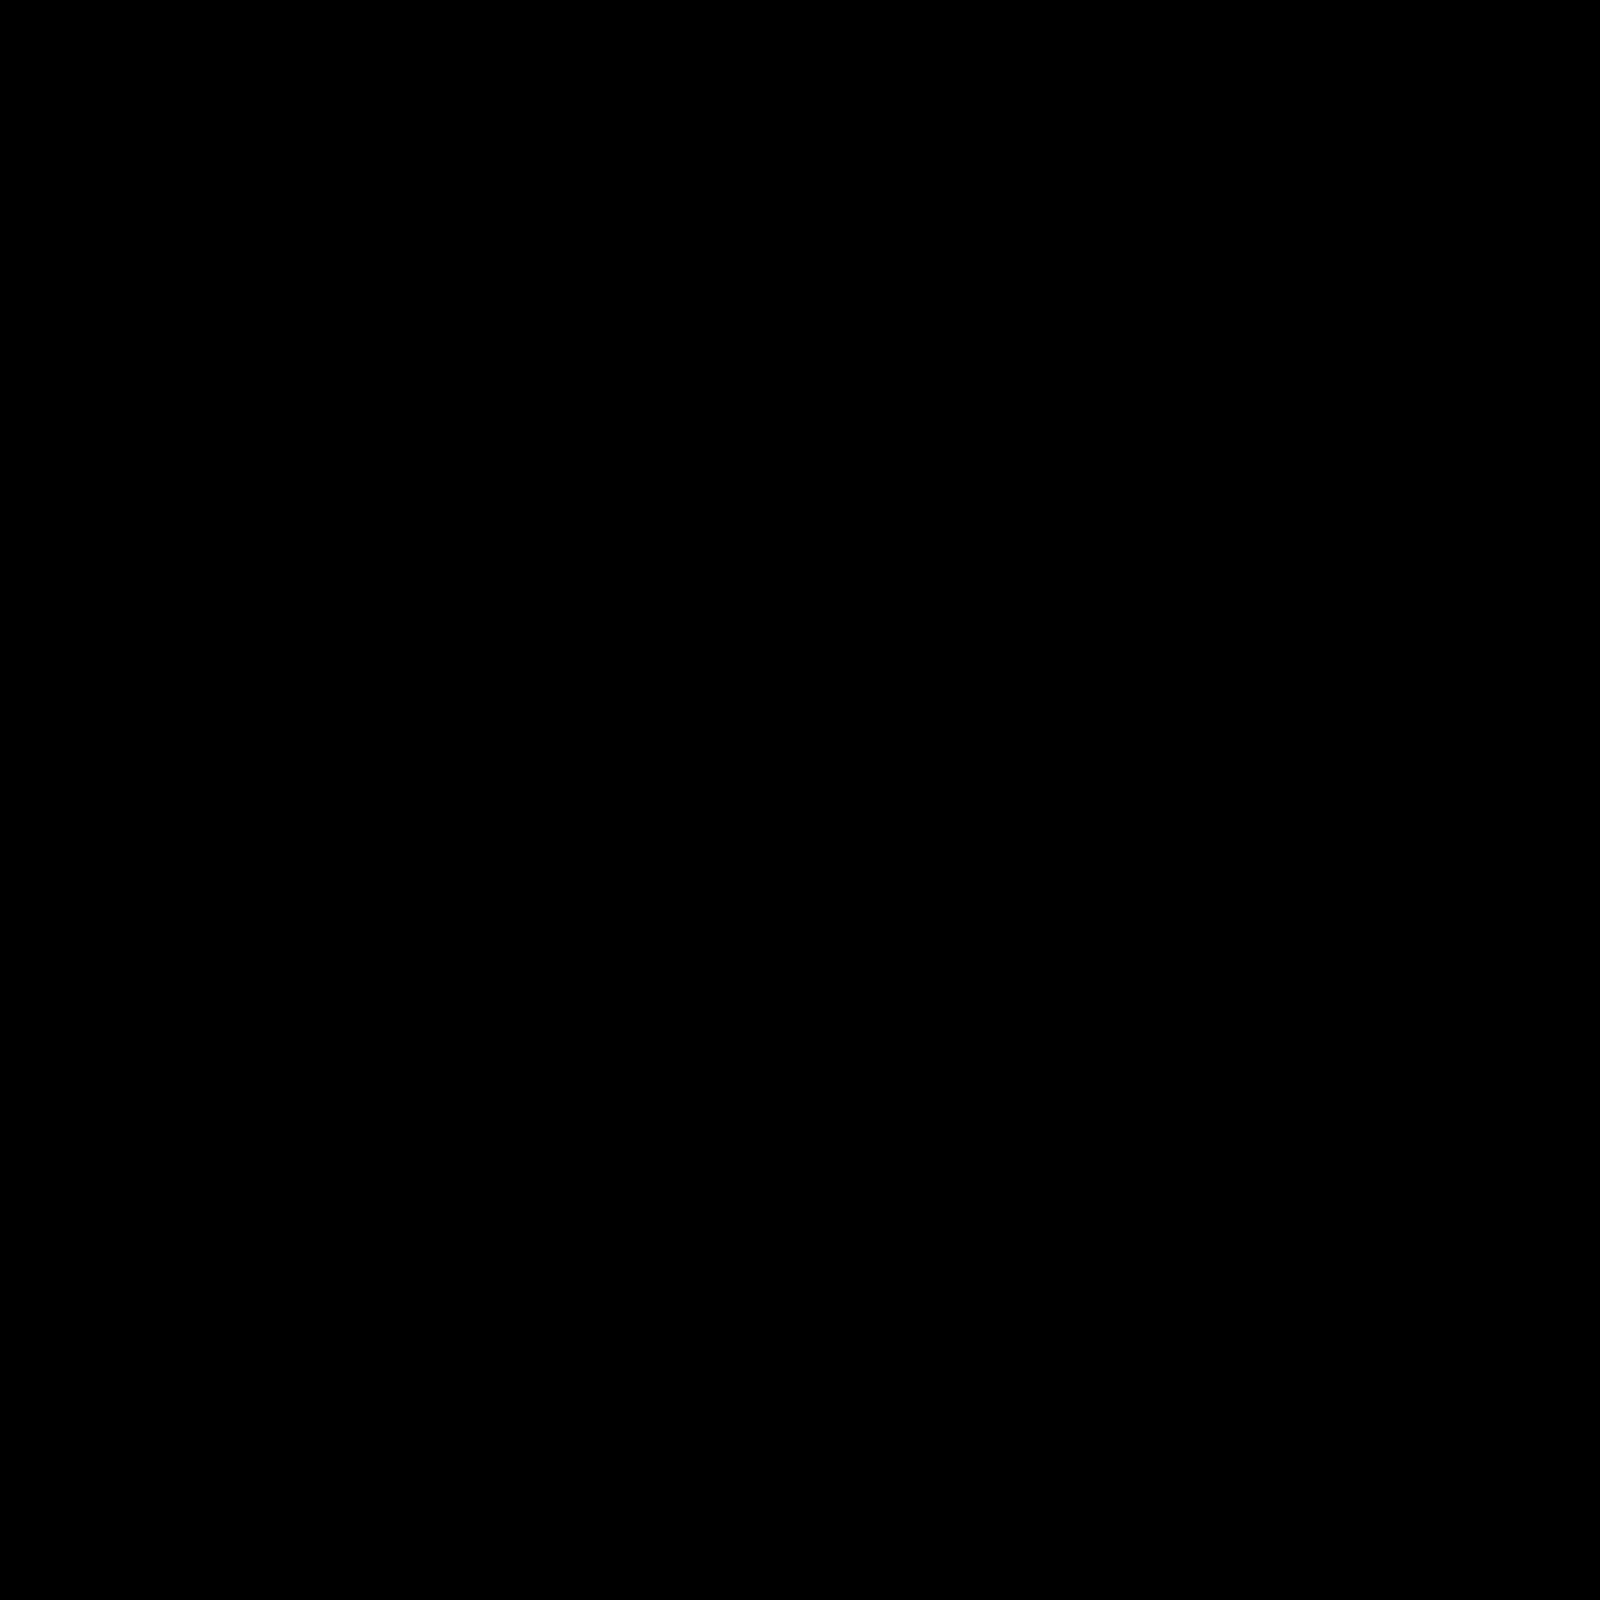 Light Dimming 10 Percent icon